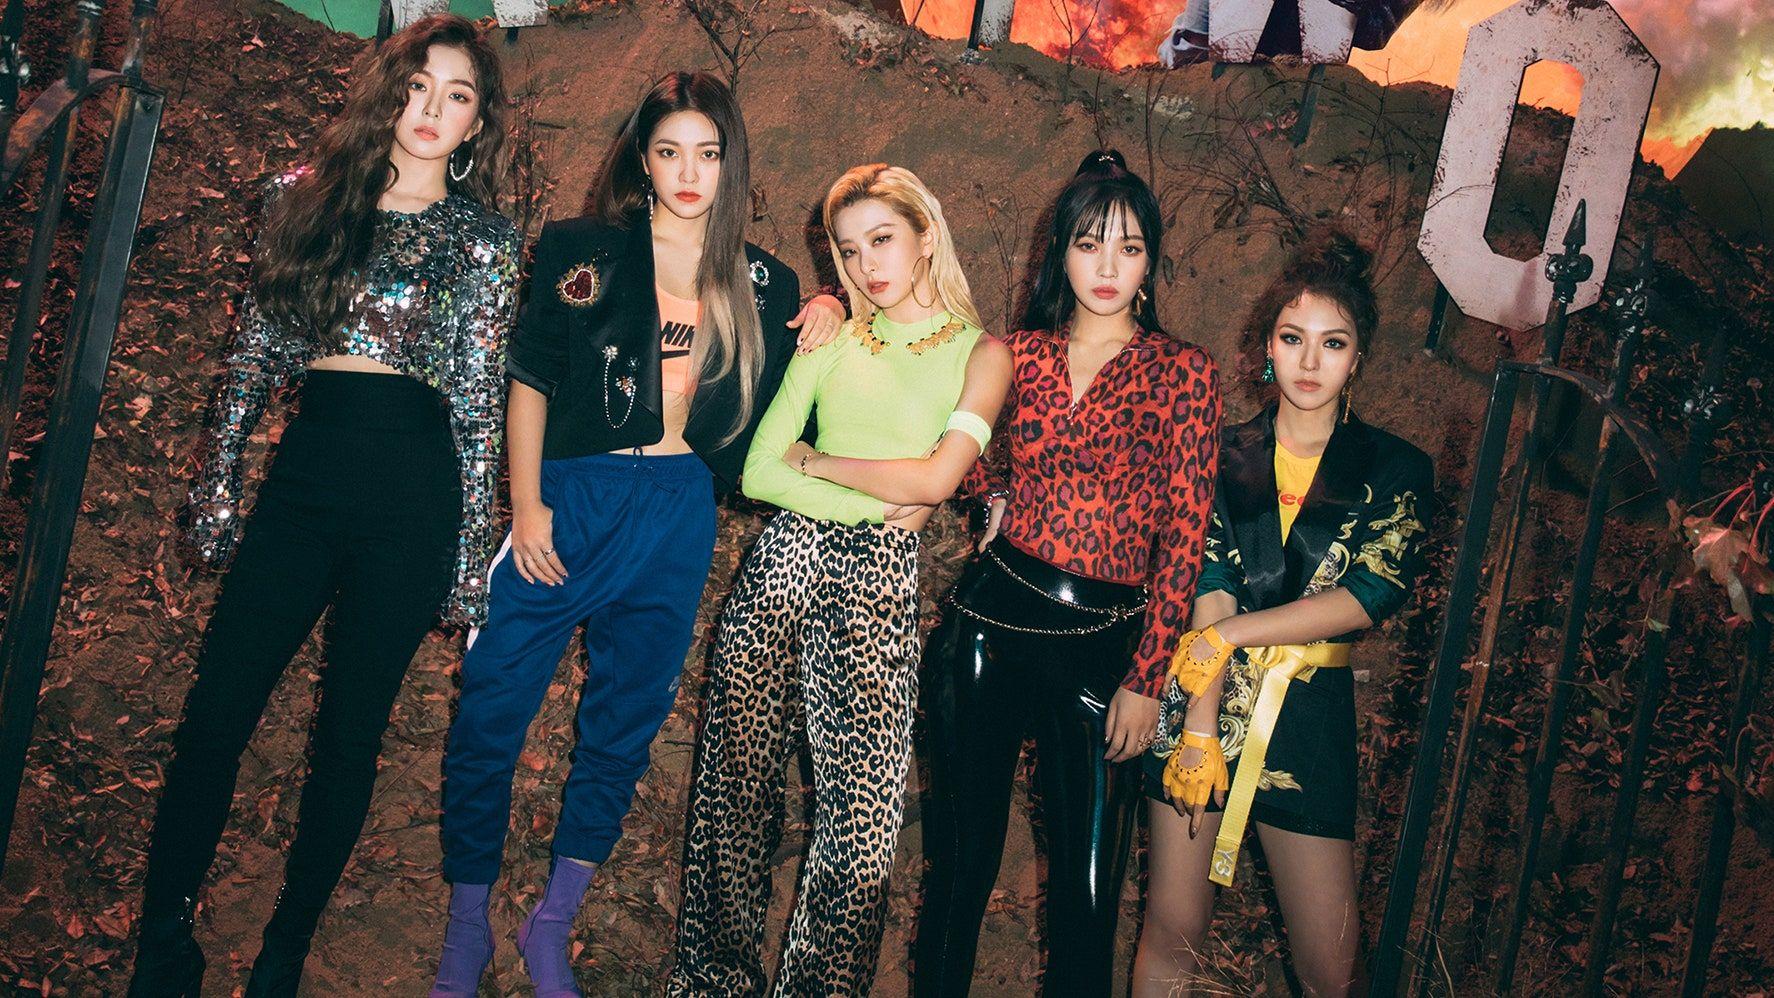 Ini Dia Dereten Girlband Korea Selatan Paling Modis Diakui Dunia